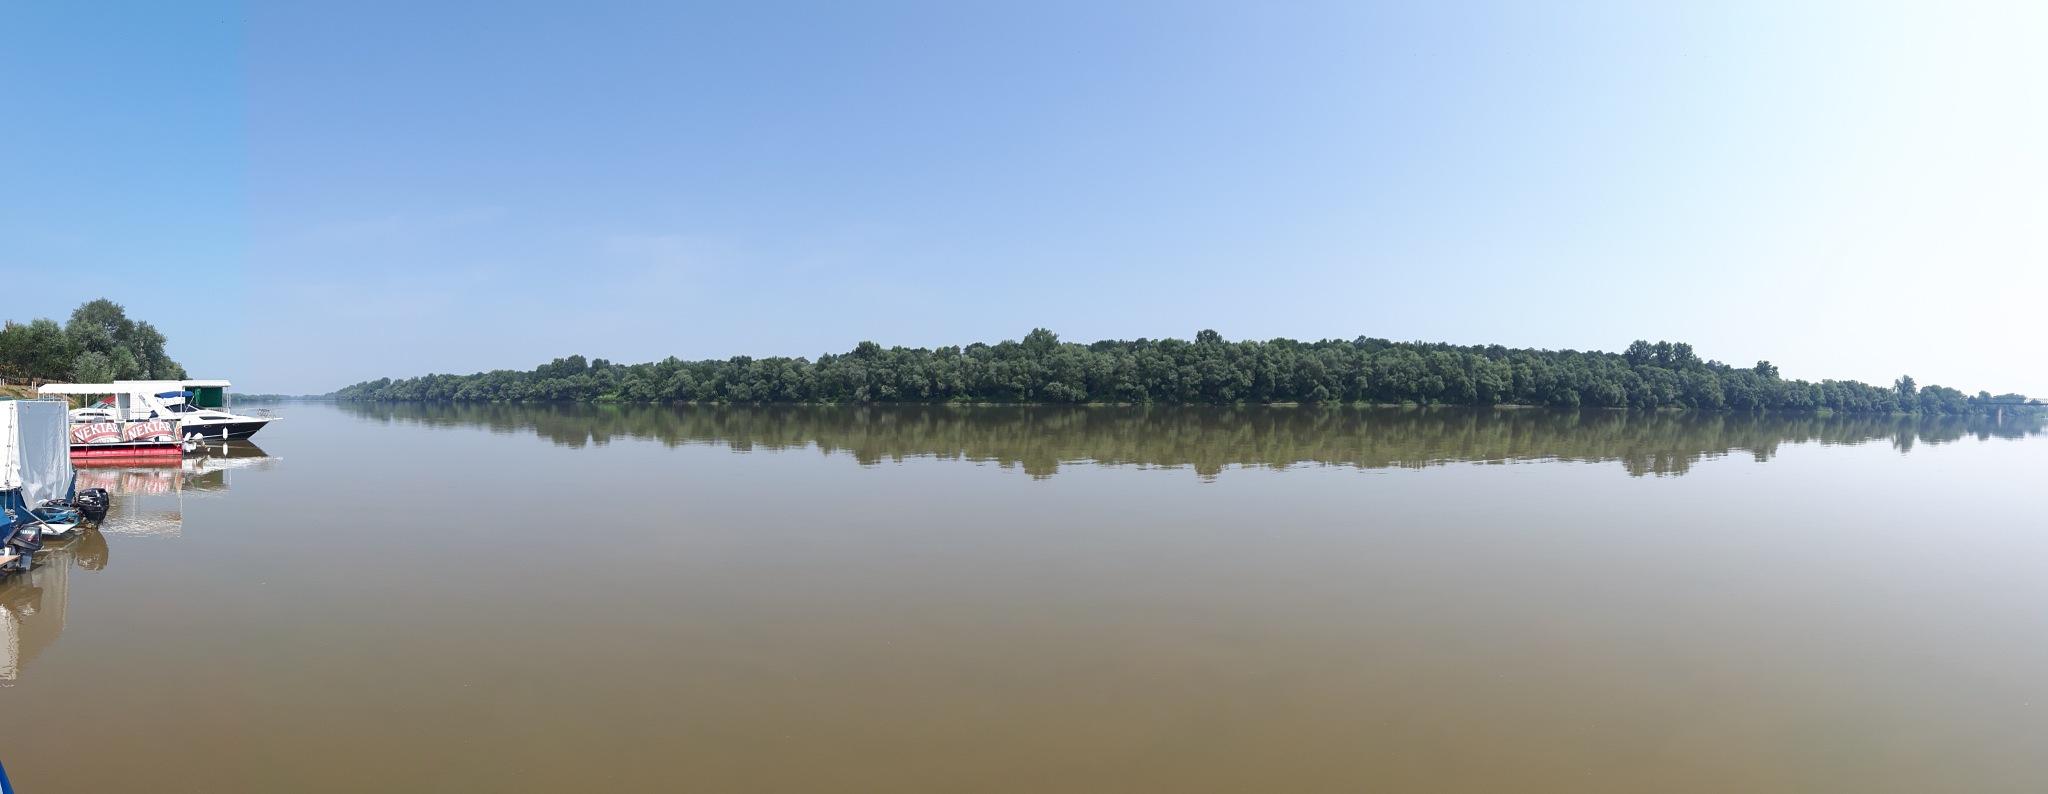 River Sava. Panoramic view. by Mevludin_Hasanovic